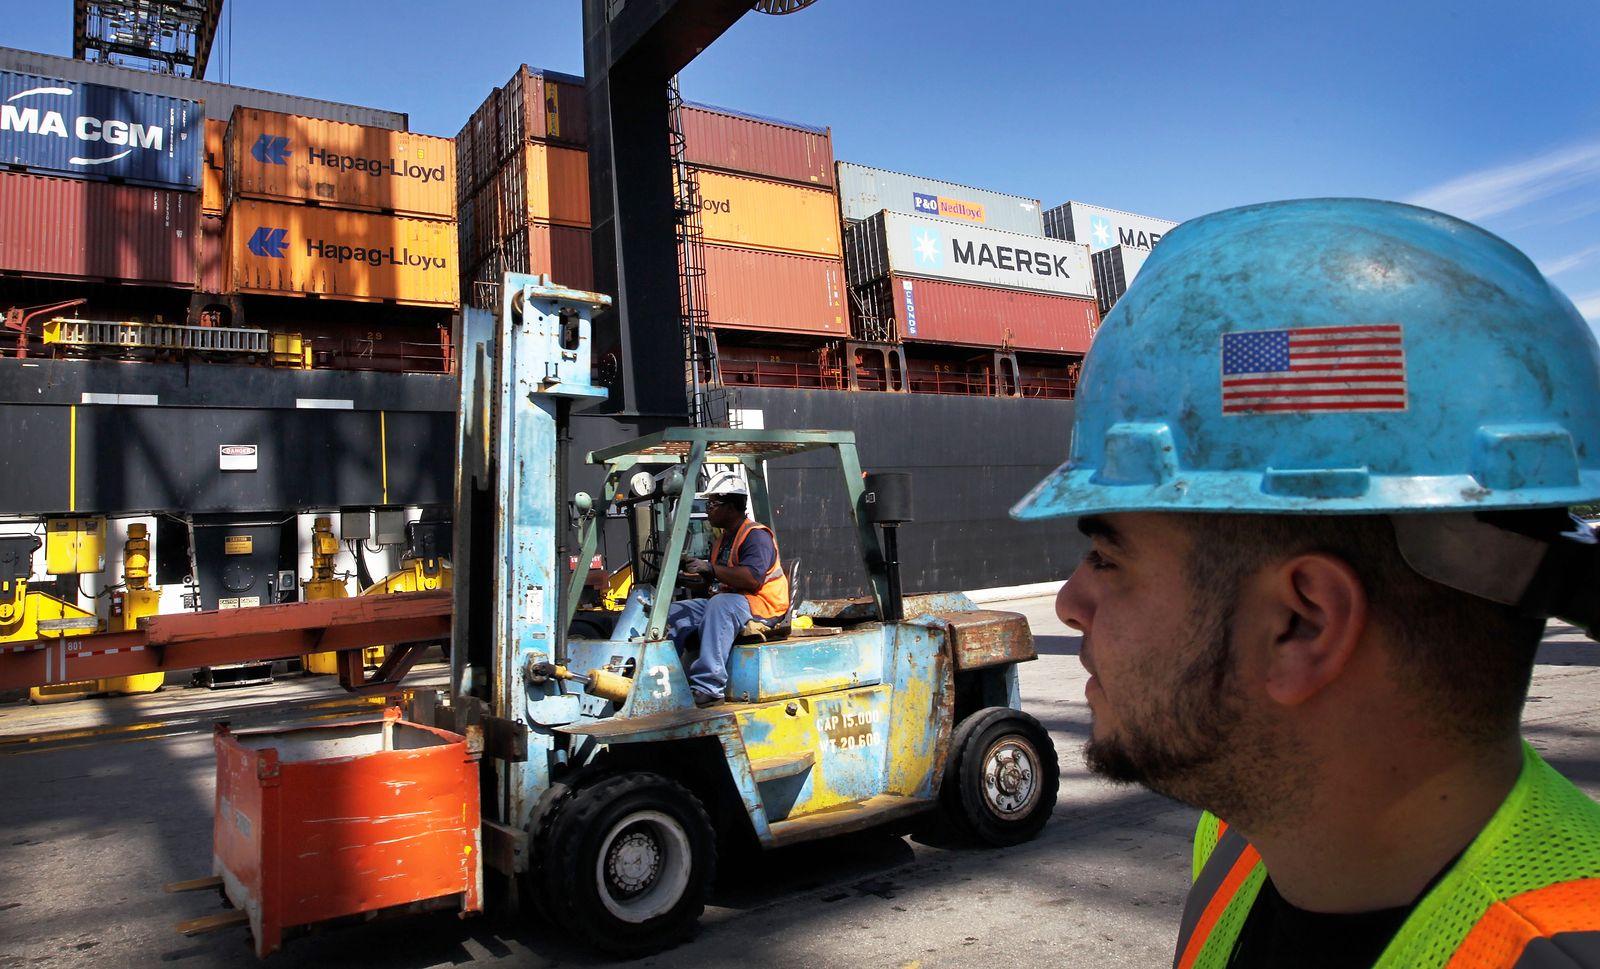 Container / Freihandelsabkommen / USA / Handel / Konjunktur